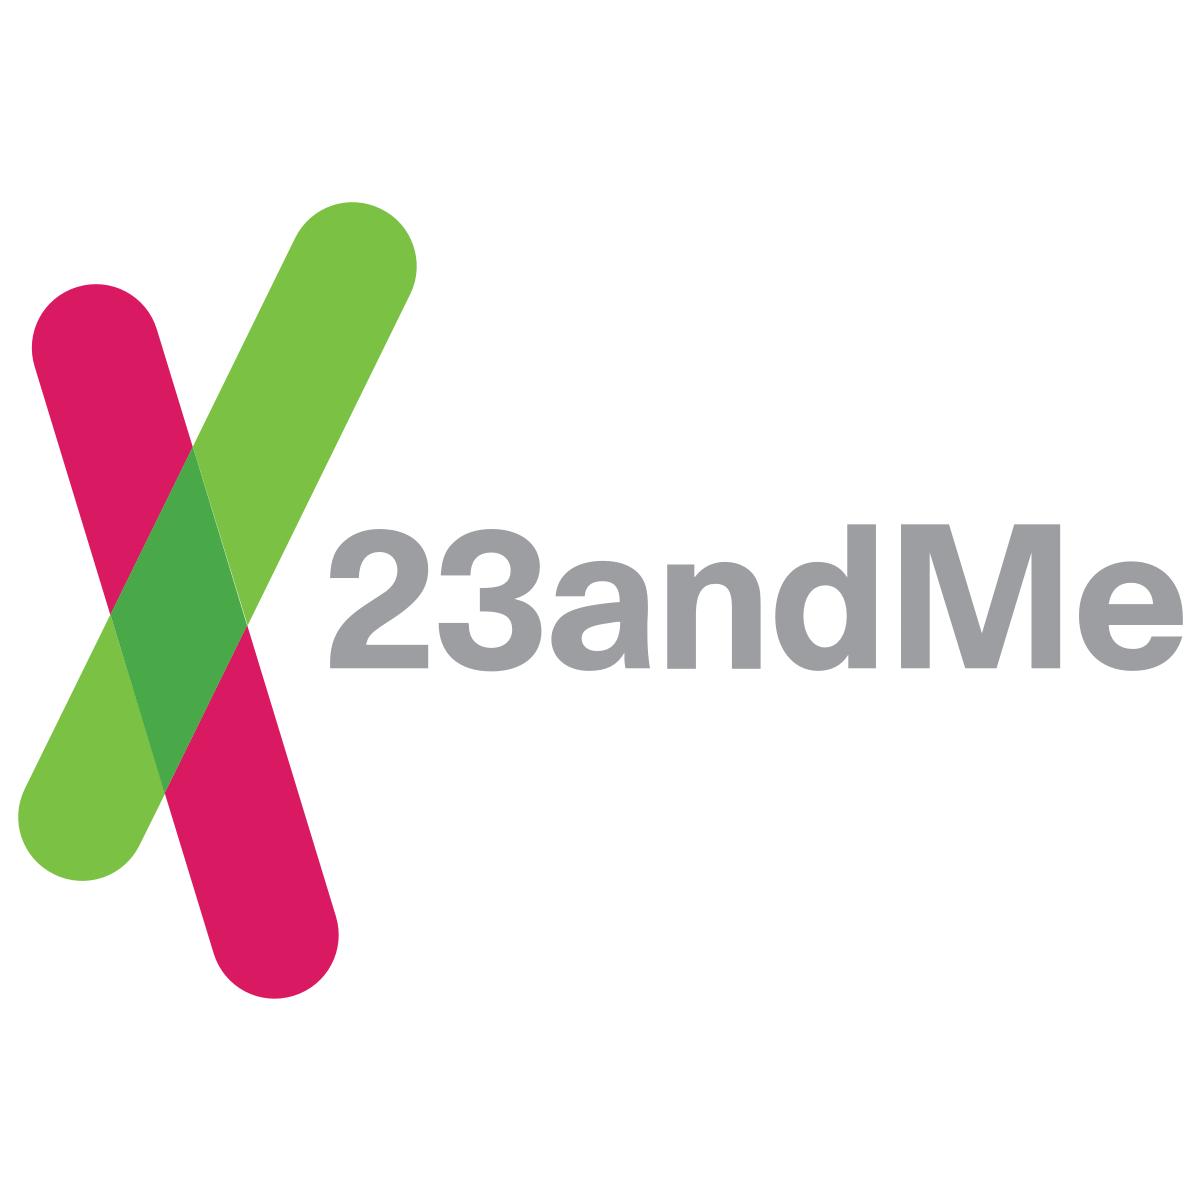 23andme-1527864492.png